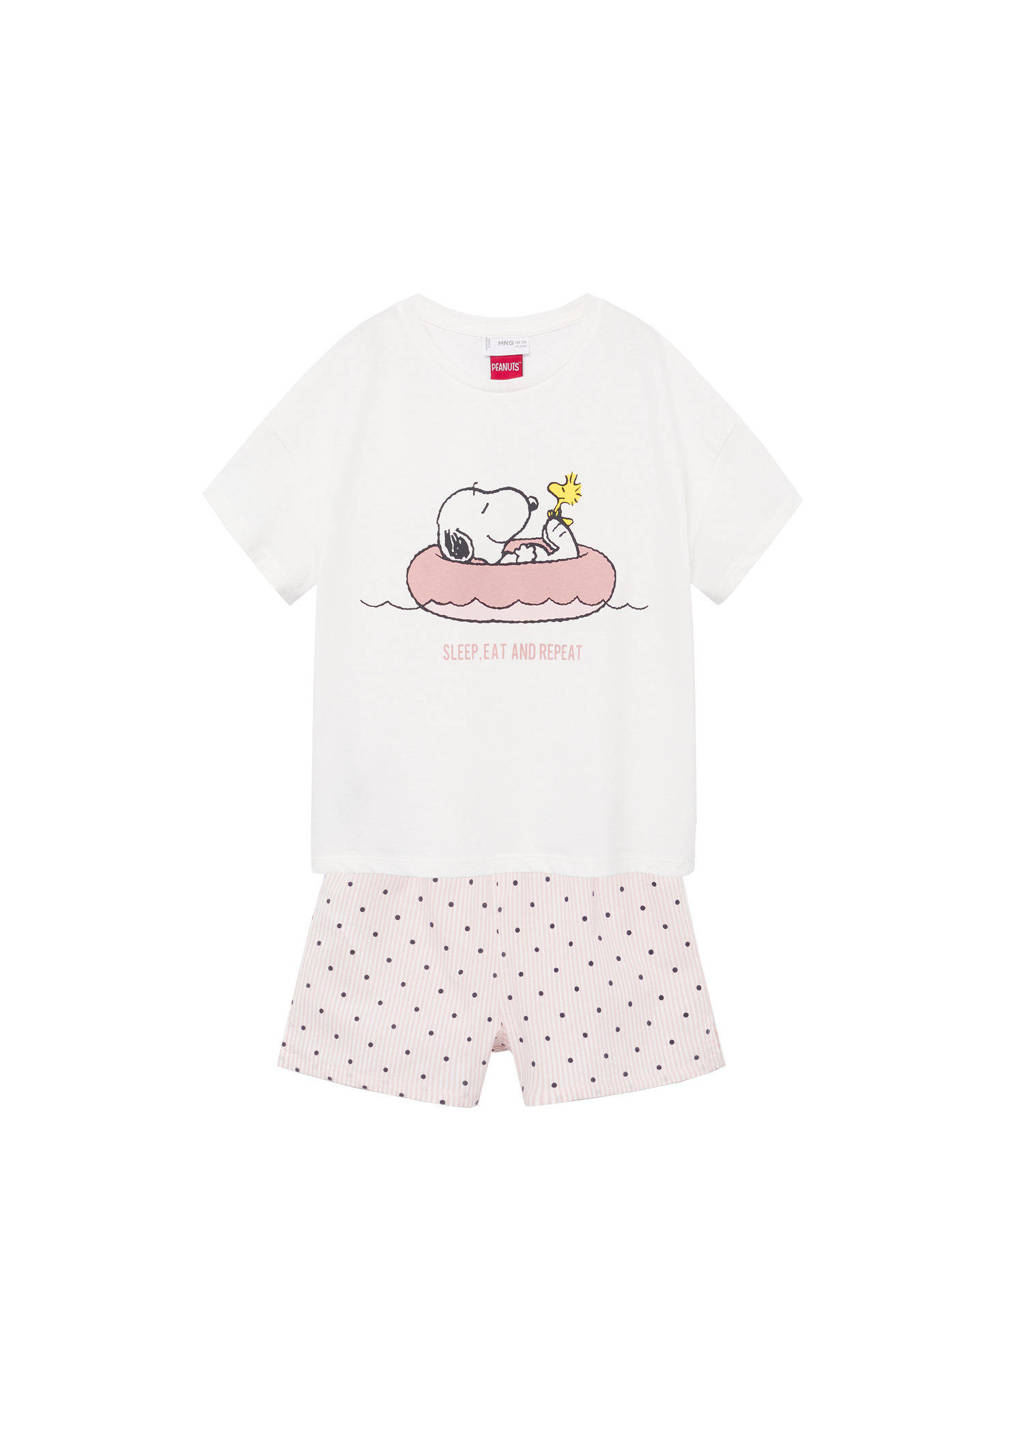 Mango Kids Snoopy shortama roze/naturel wit, Roze/naturel wit